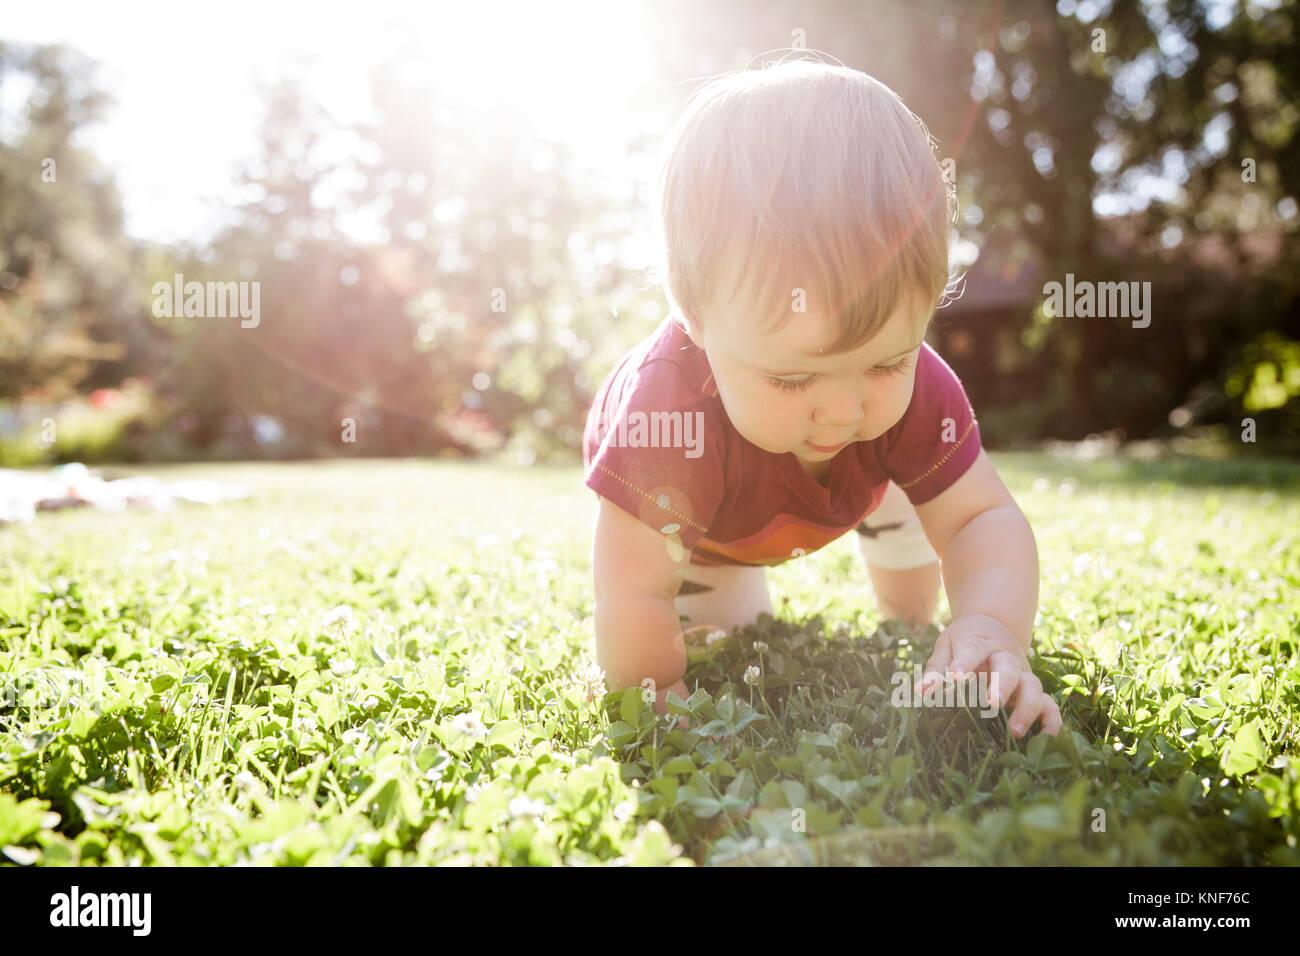 Baby boy crawling on grass - Stock Image